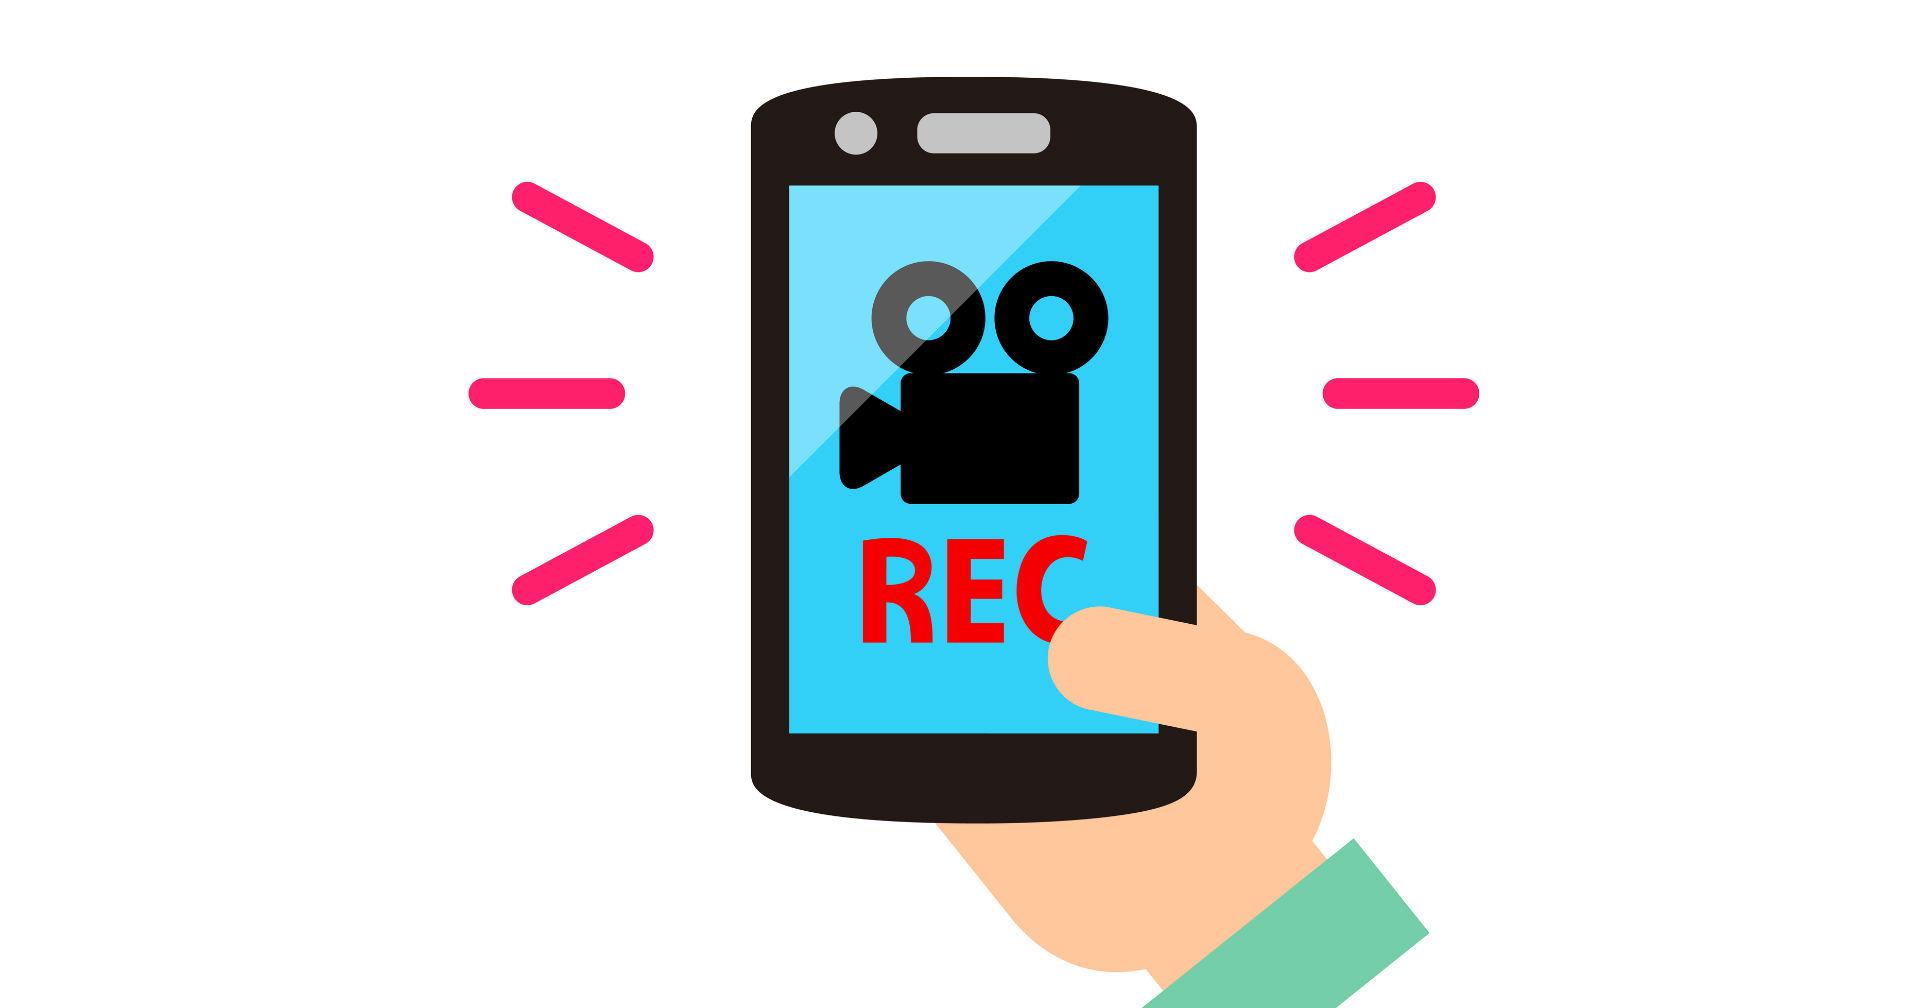 androidで画面を録画するアプリの解説と音声付きで録画する方法